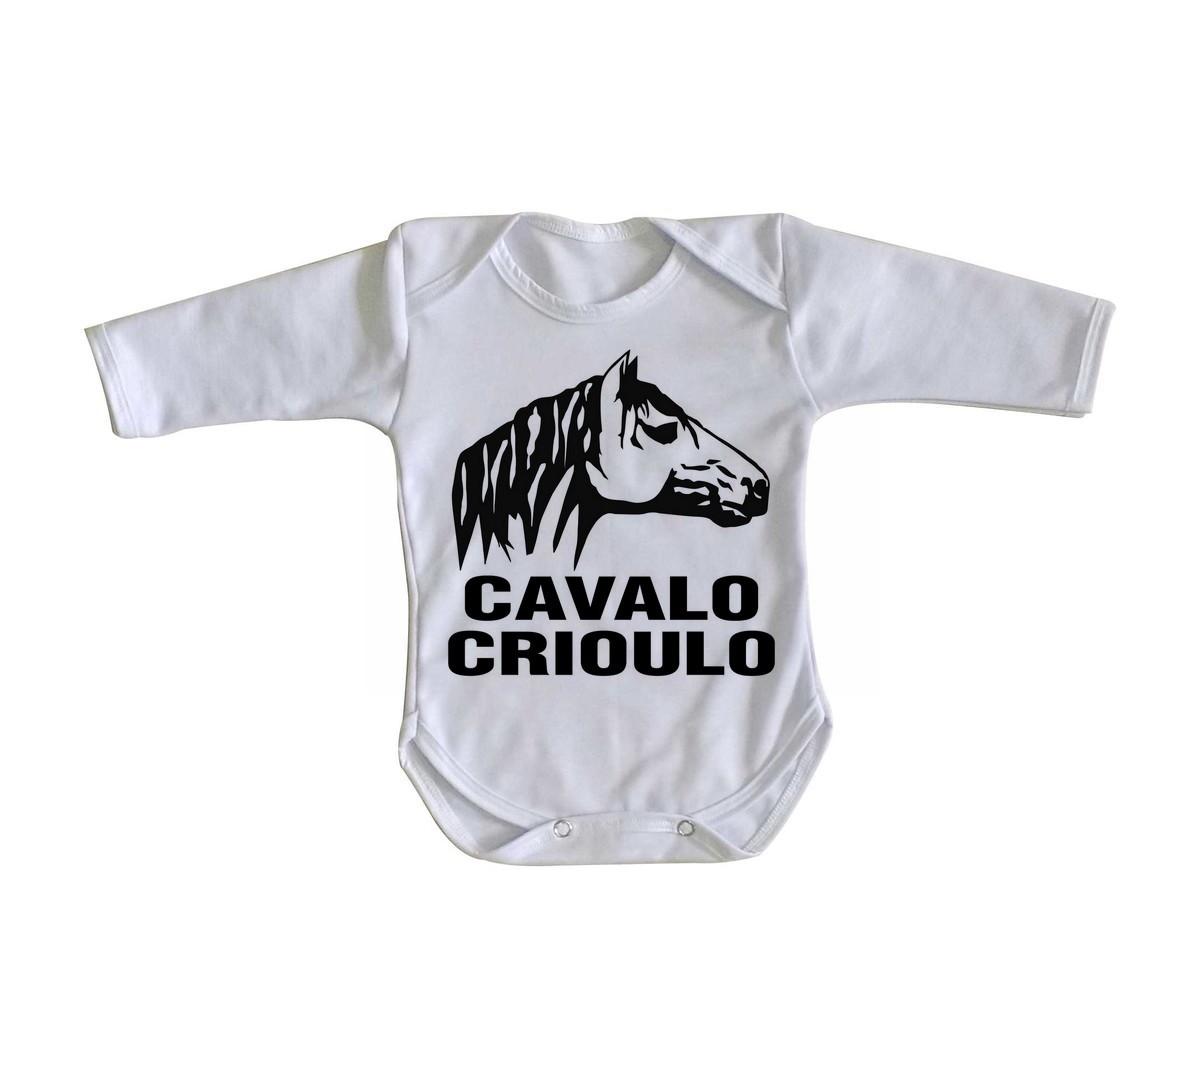 24b176e79e Body bebê roupa nenê cavalo crioulo rodeio gaucho no Elo7 ...